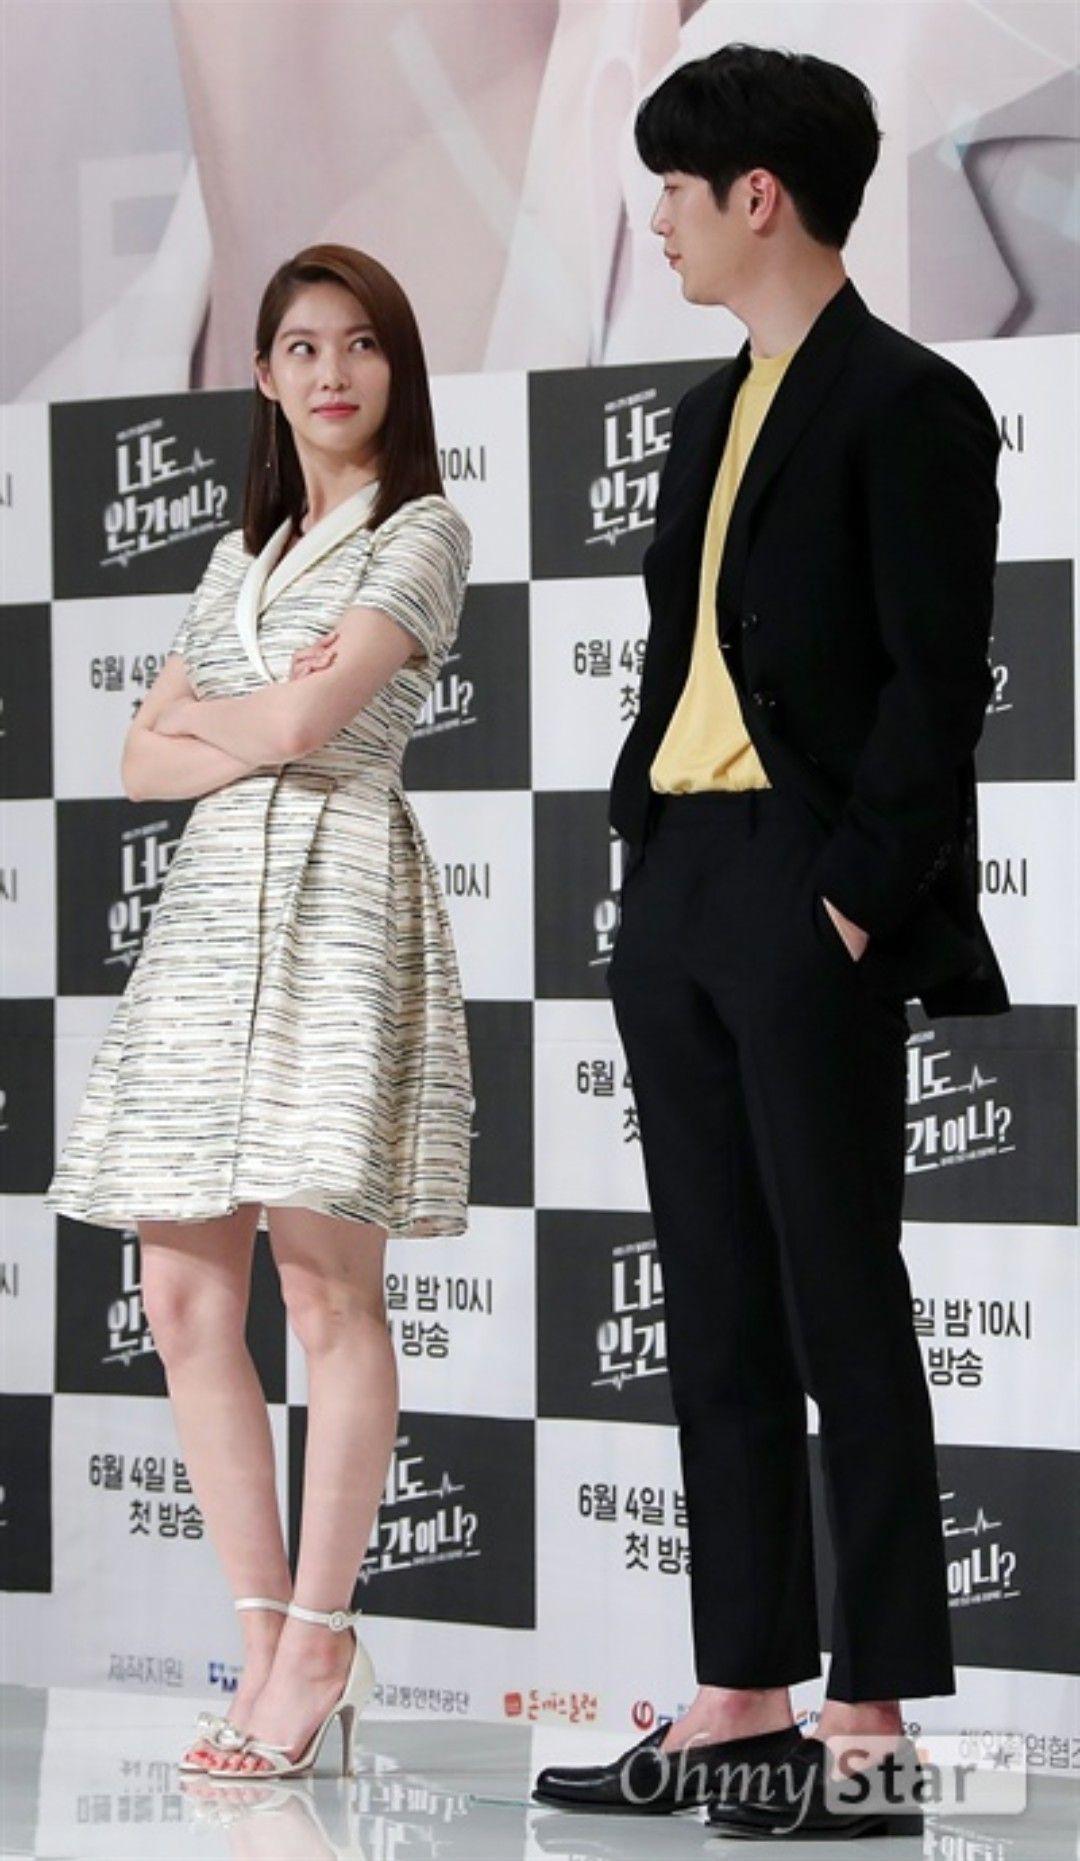 Gong Seung yeon and Seo Kang joon - Gong seung yeon, Seo ...